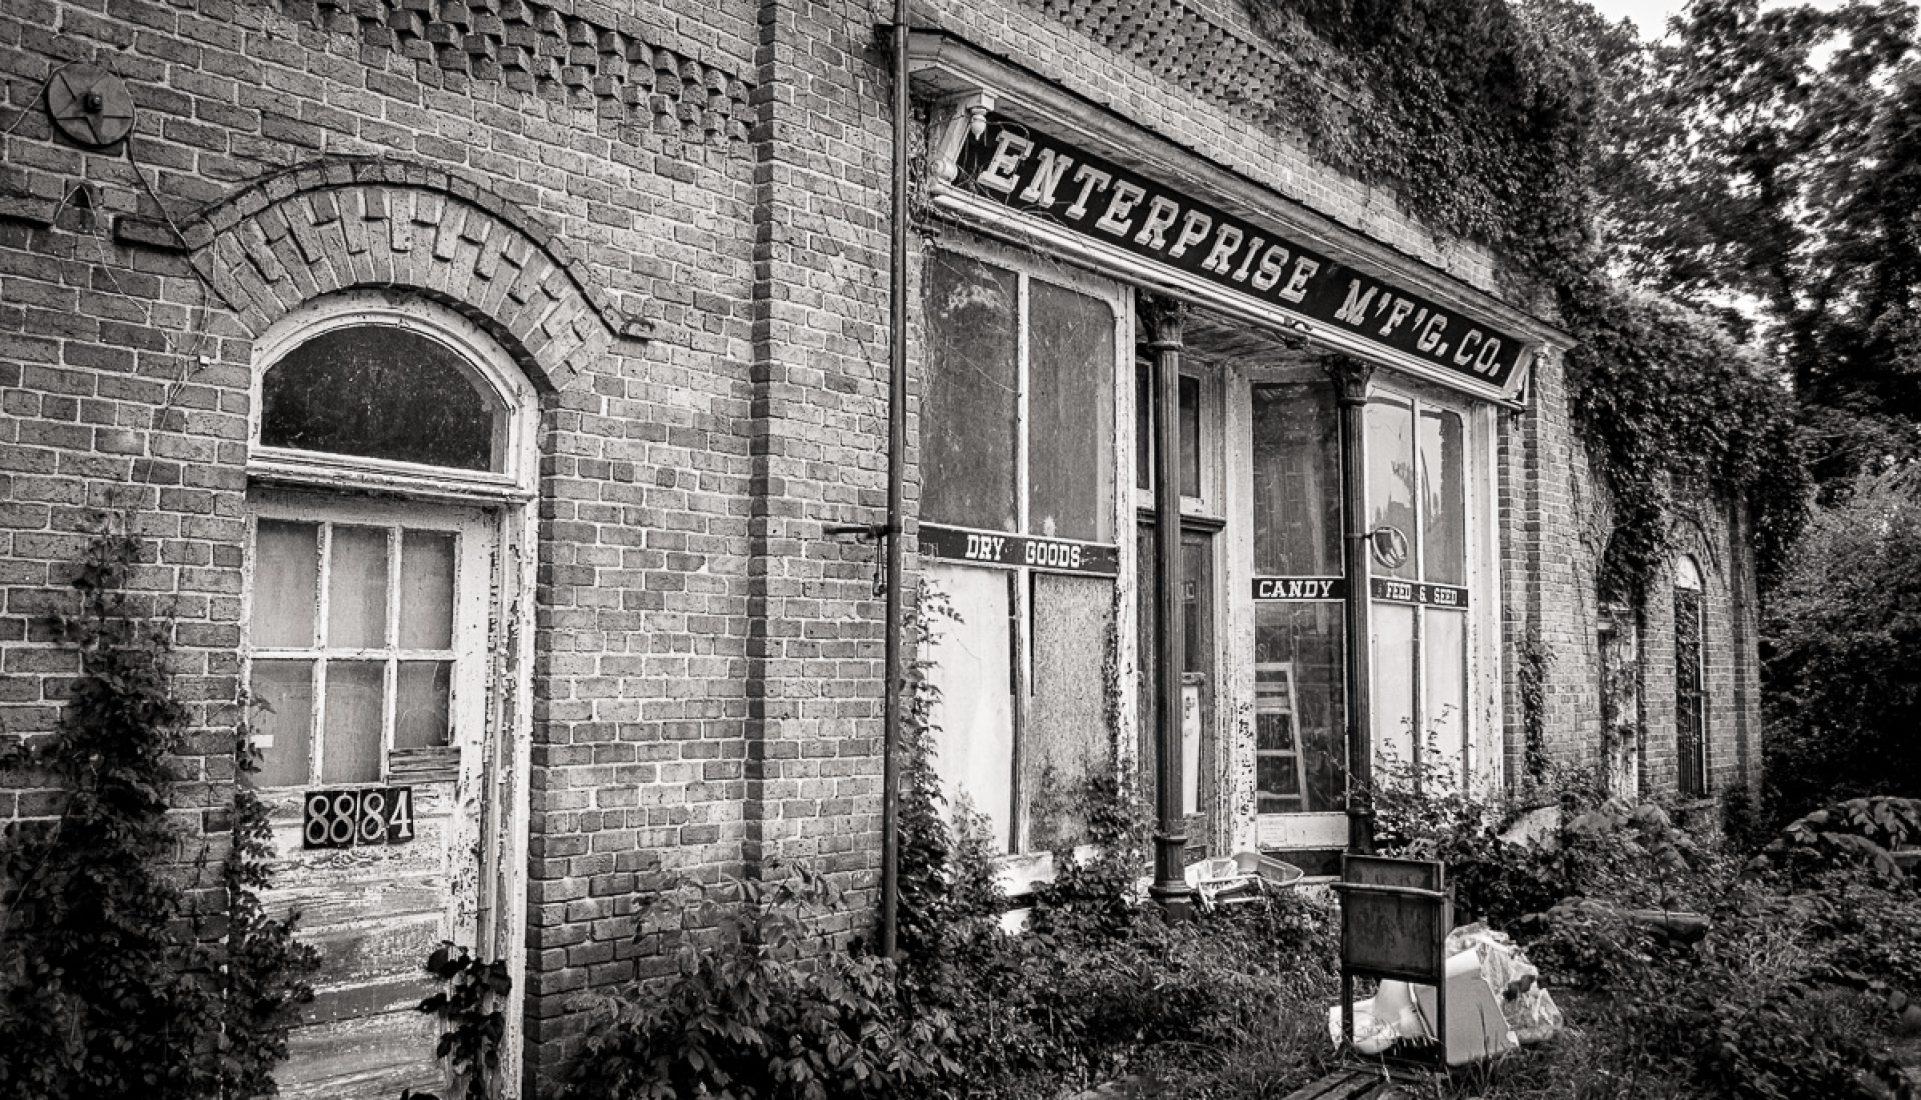 Enterprise M'F'G. Co.